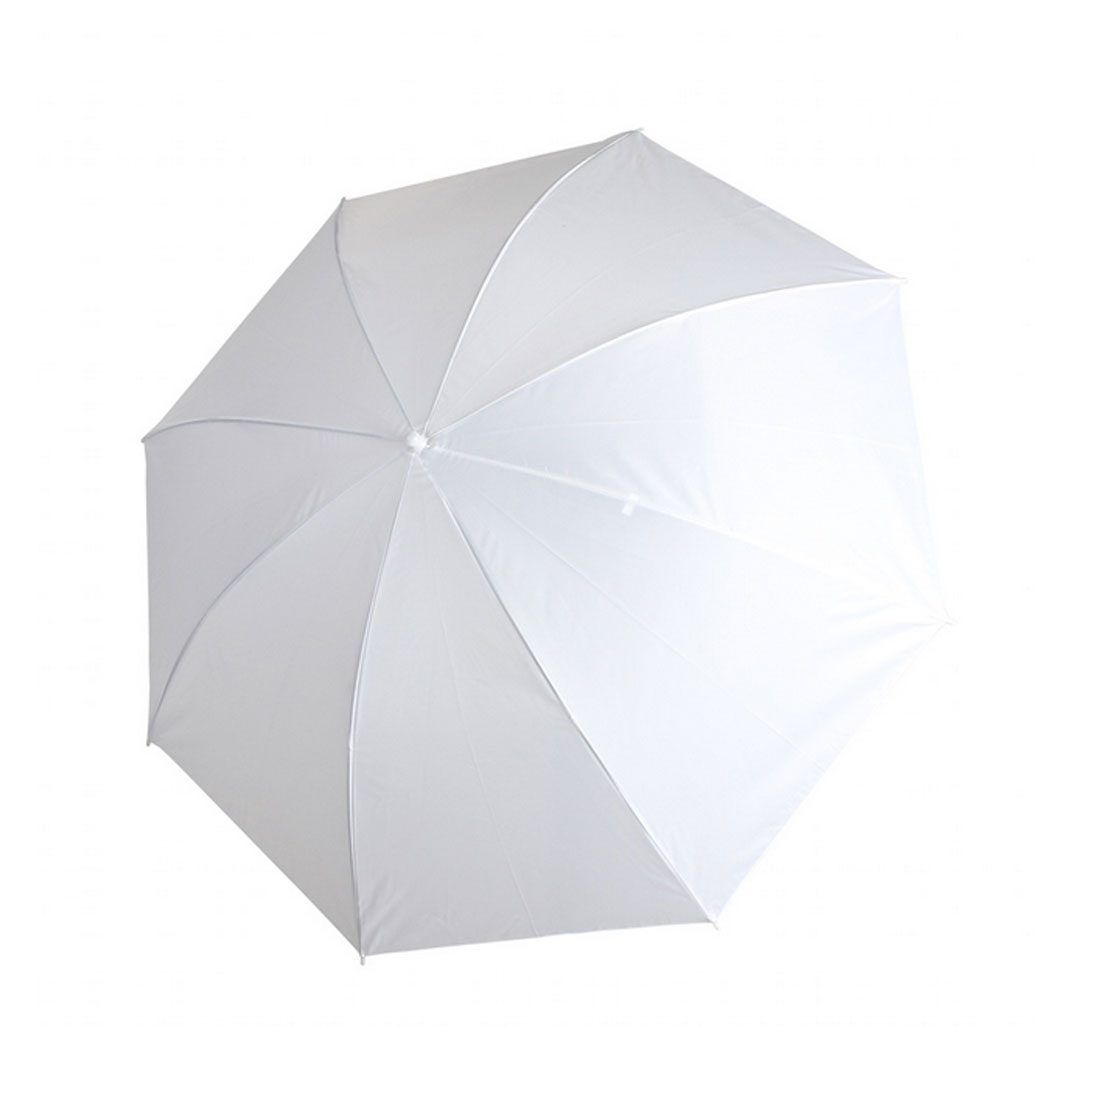 HONGDAK New Sale 33 Photo Studio Video Soft Umbrella Photography Translucent Flash Light Diffuser Umbrella Camera Accessories